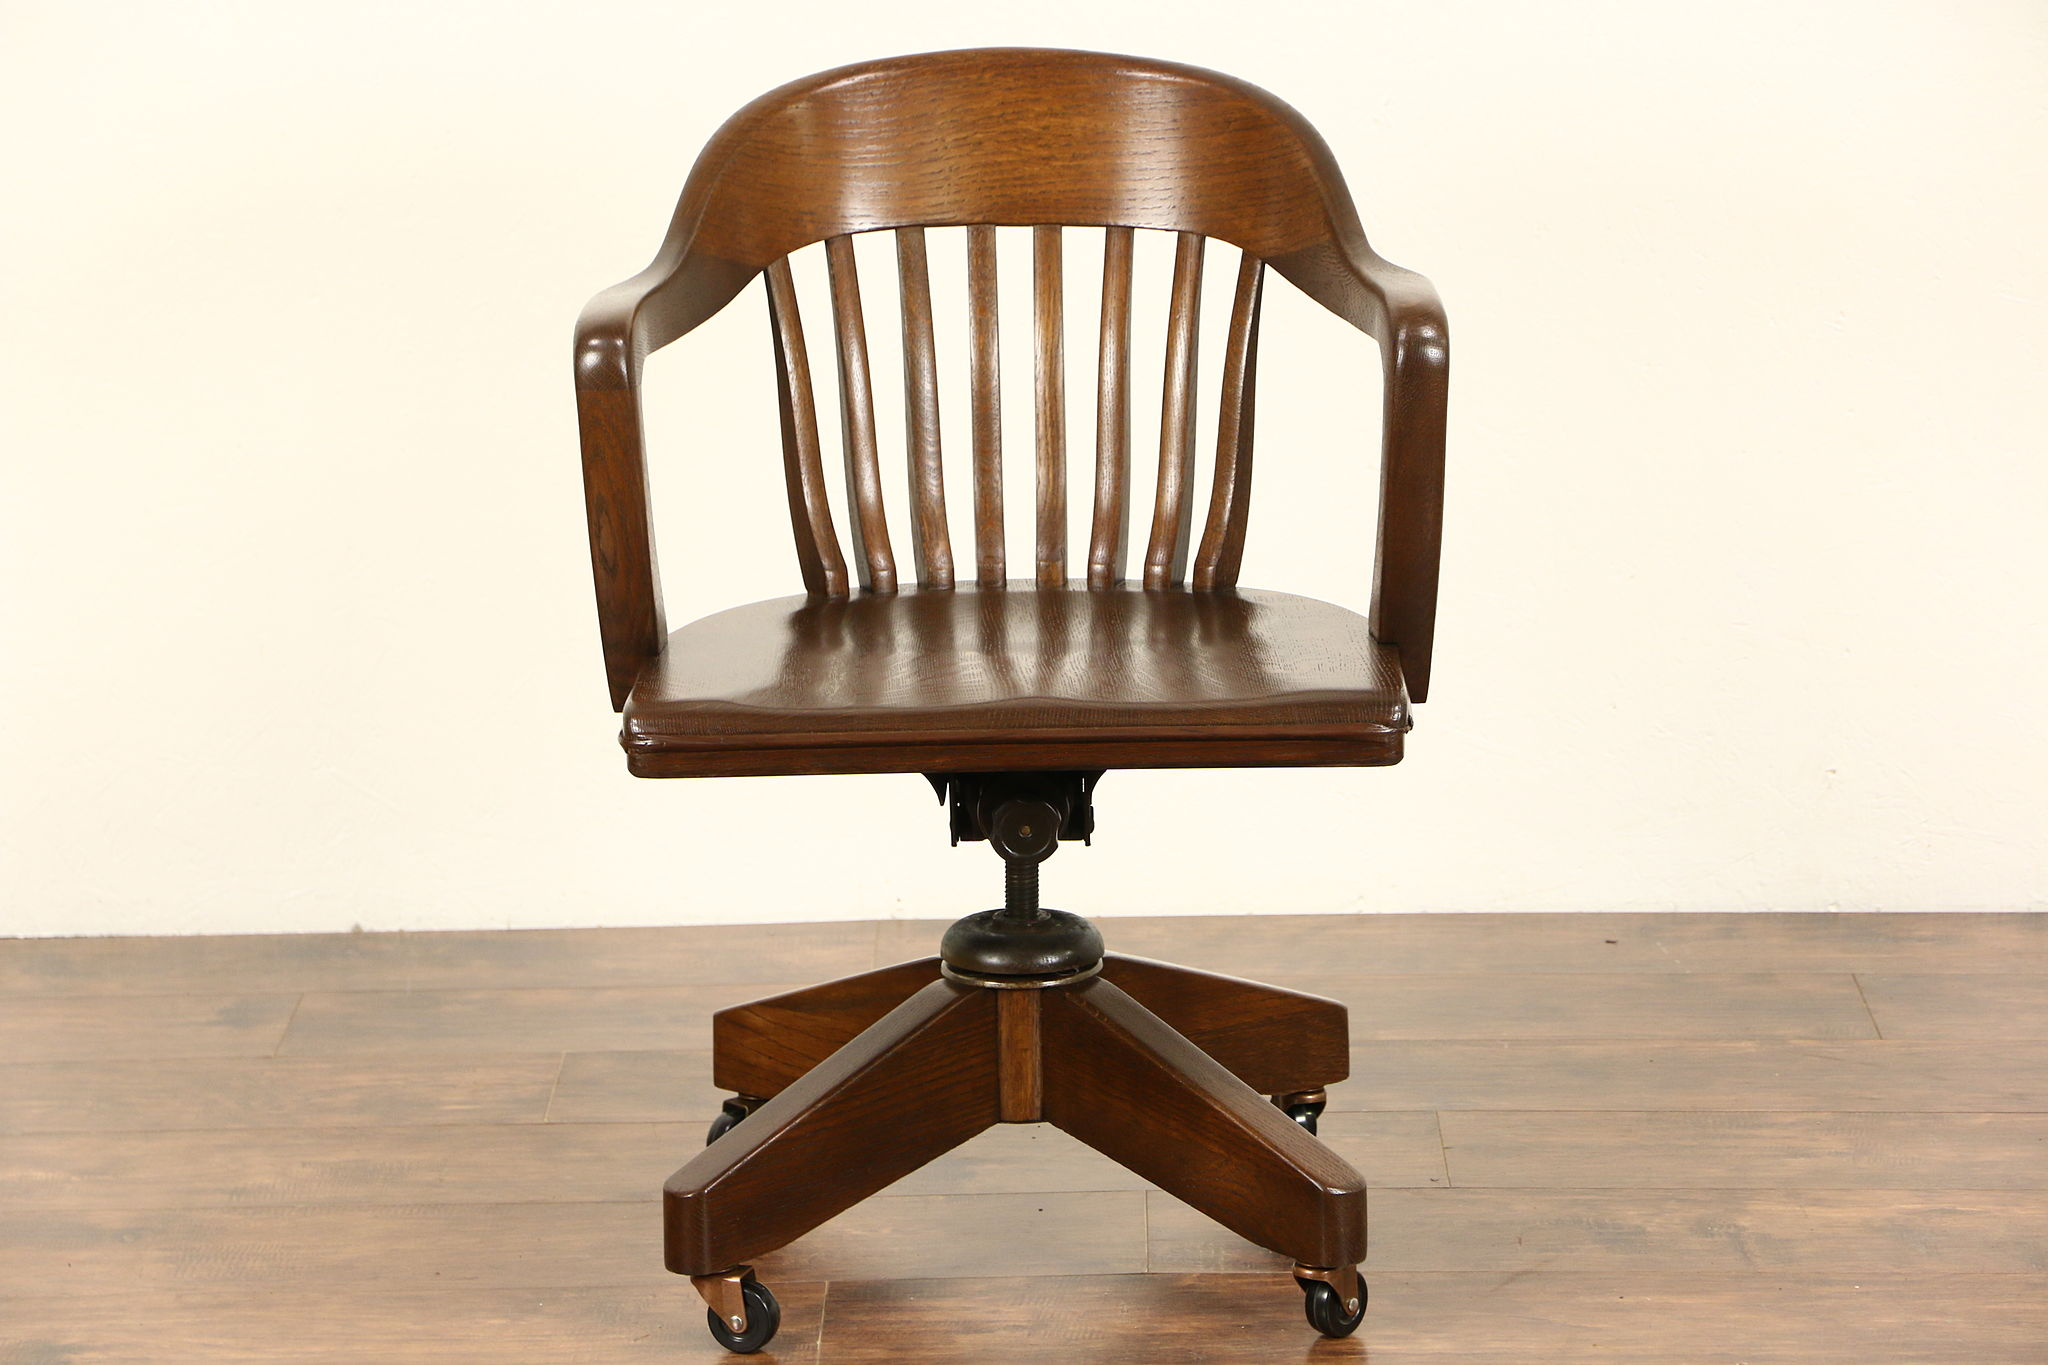 oak swivel adjustable 1930s vintage desk chair signed blackwell st louis antique wooden desk chair